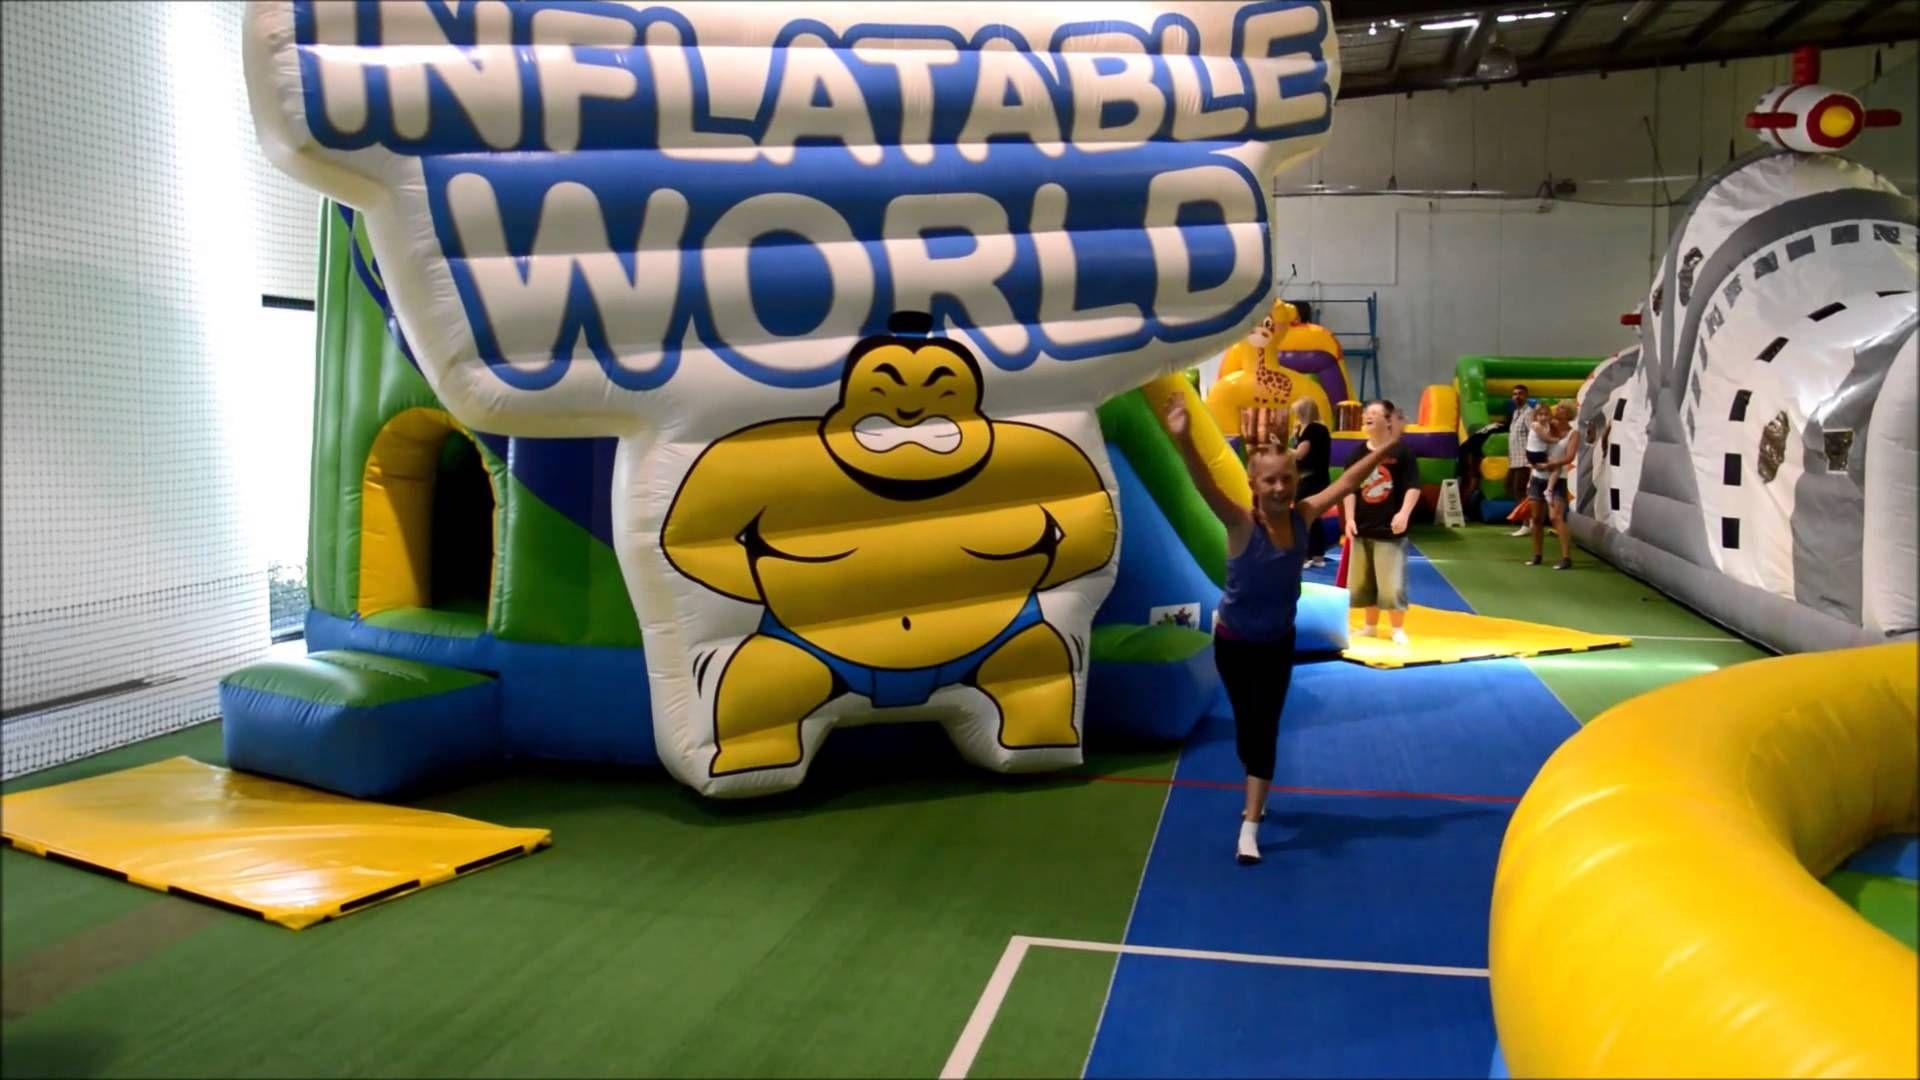 Inflatable world mornington inflatable world australia kids fun explore kids fun grand opening and more inflatable world mornington negle Choice Image